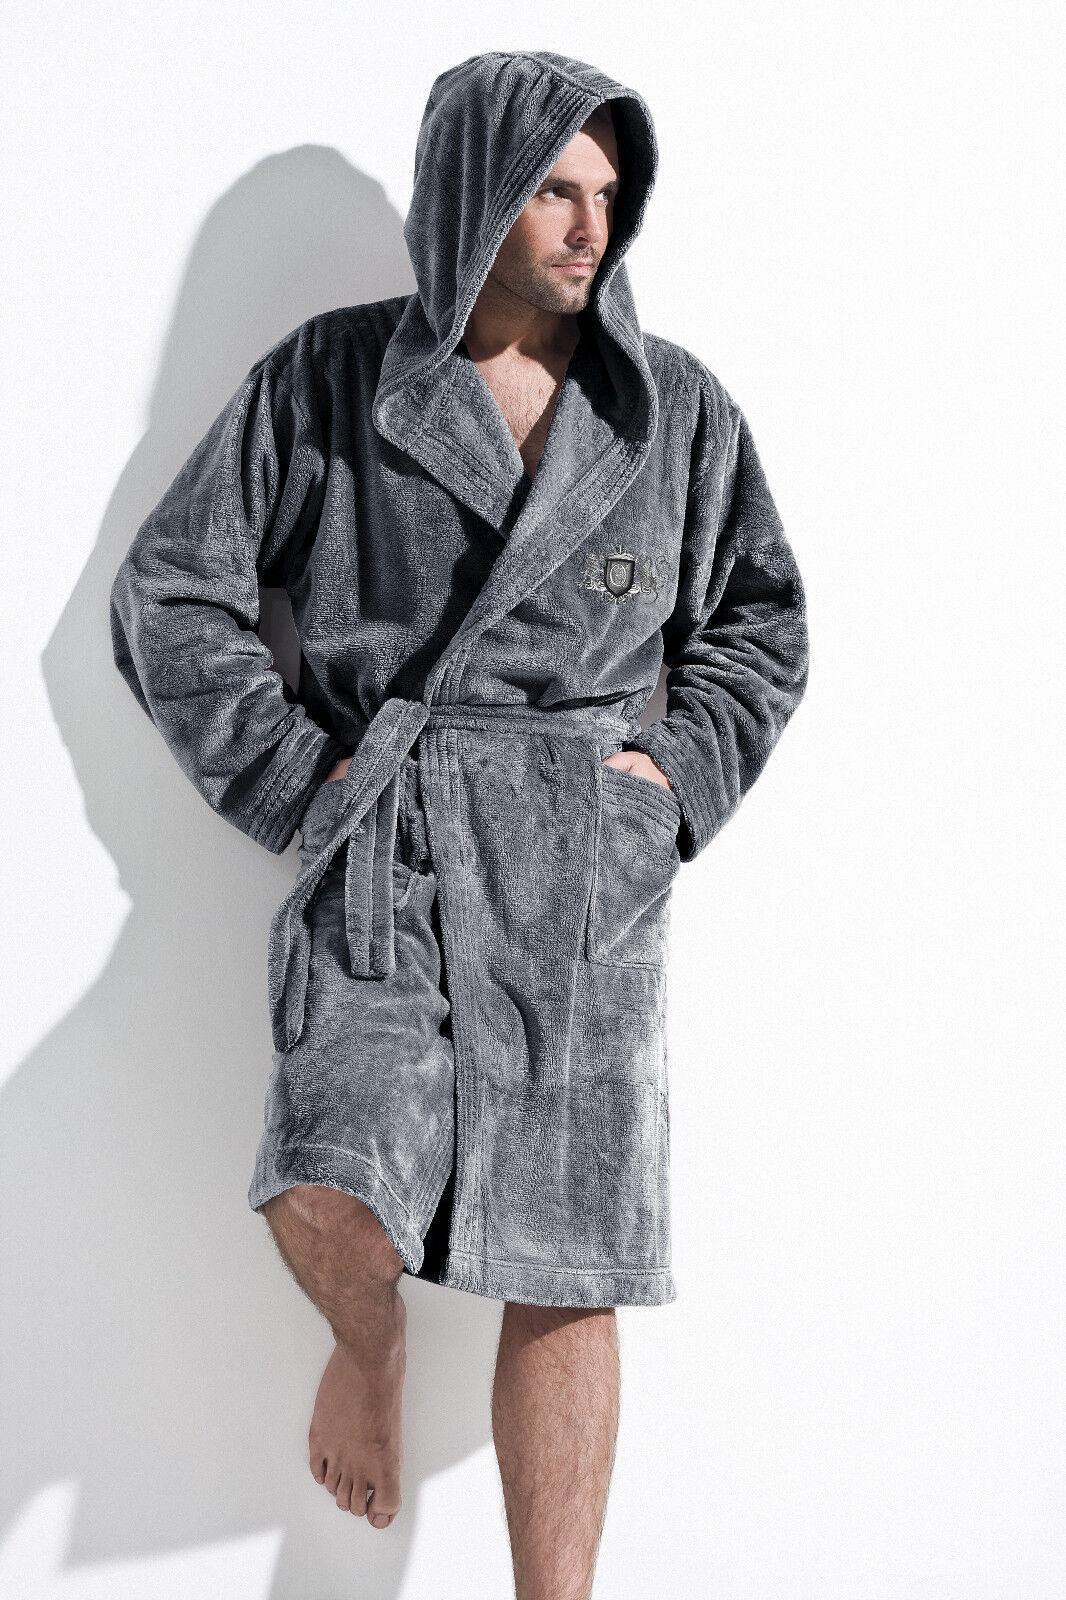 Mens Luxury Dressing Gown Housecoat Bathrobe with Hood, Robe UK Size ...